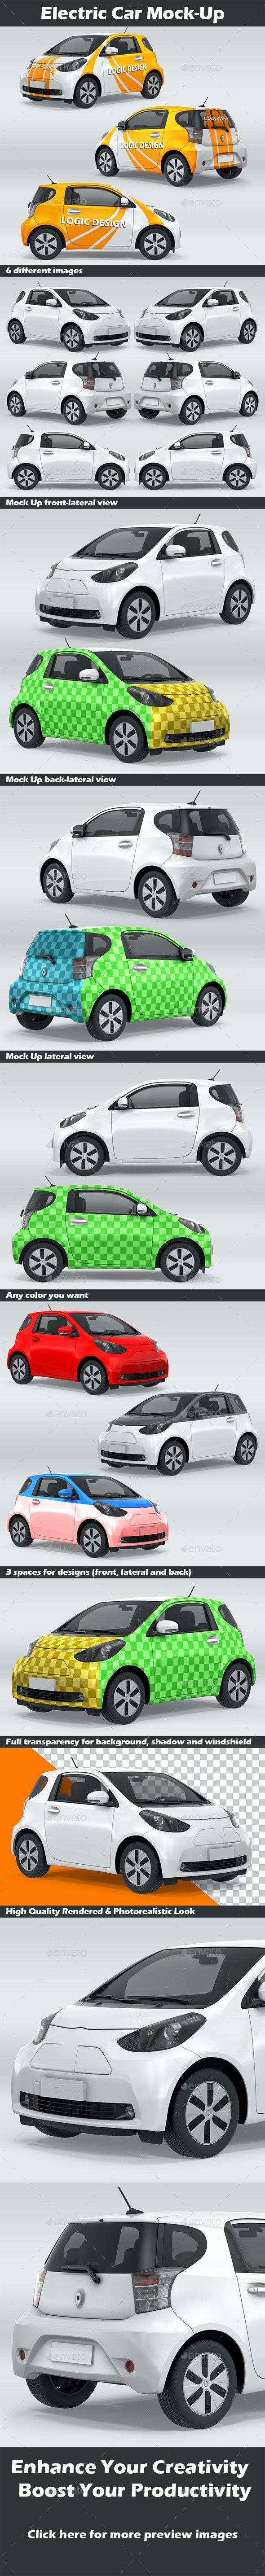 Electric Car Mock-Up - Product Mock-Ups Graphics